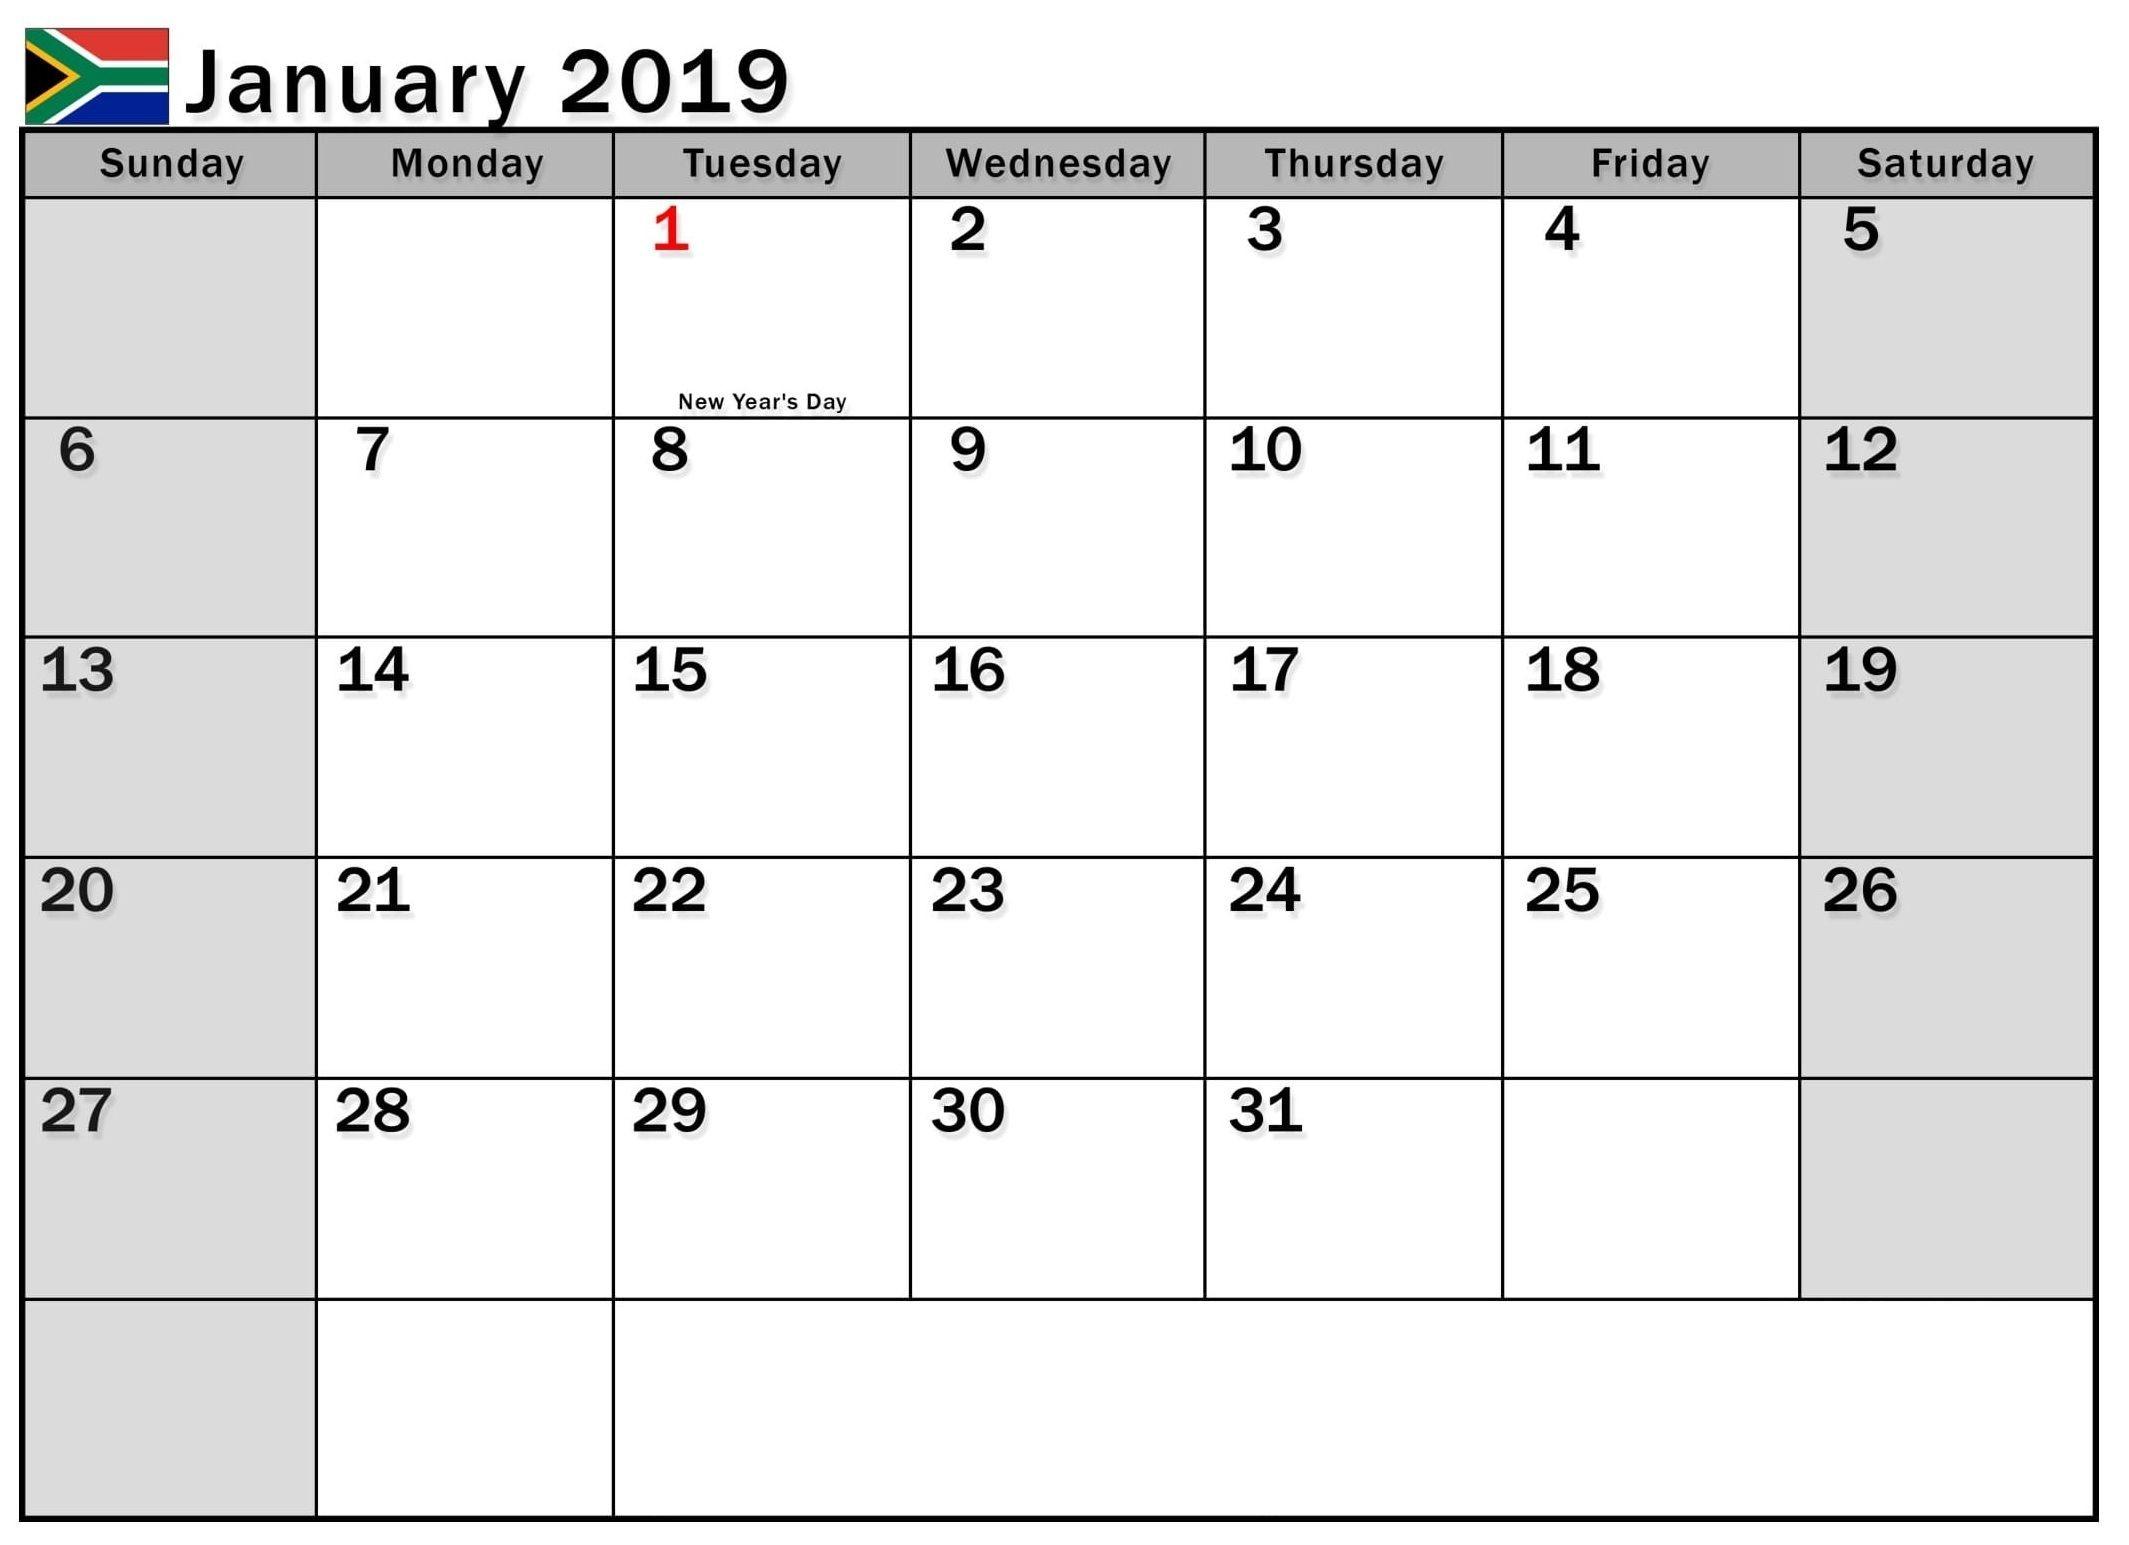 January 2019 Calendar With Holidays South Africa-Calendar Template South Africa